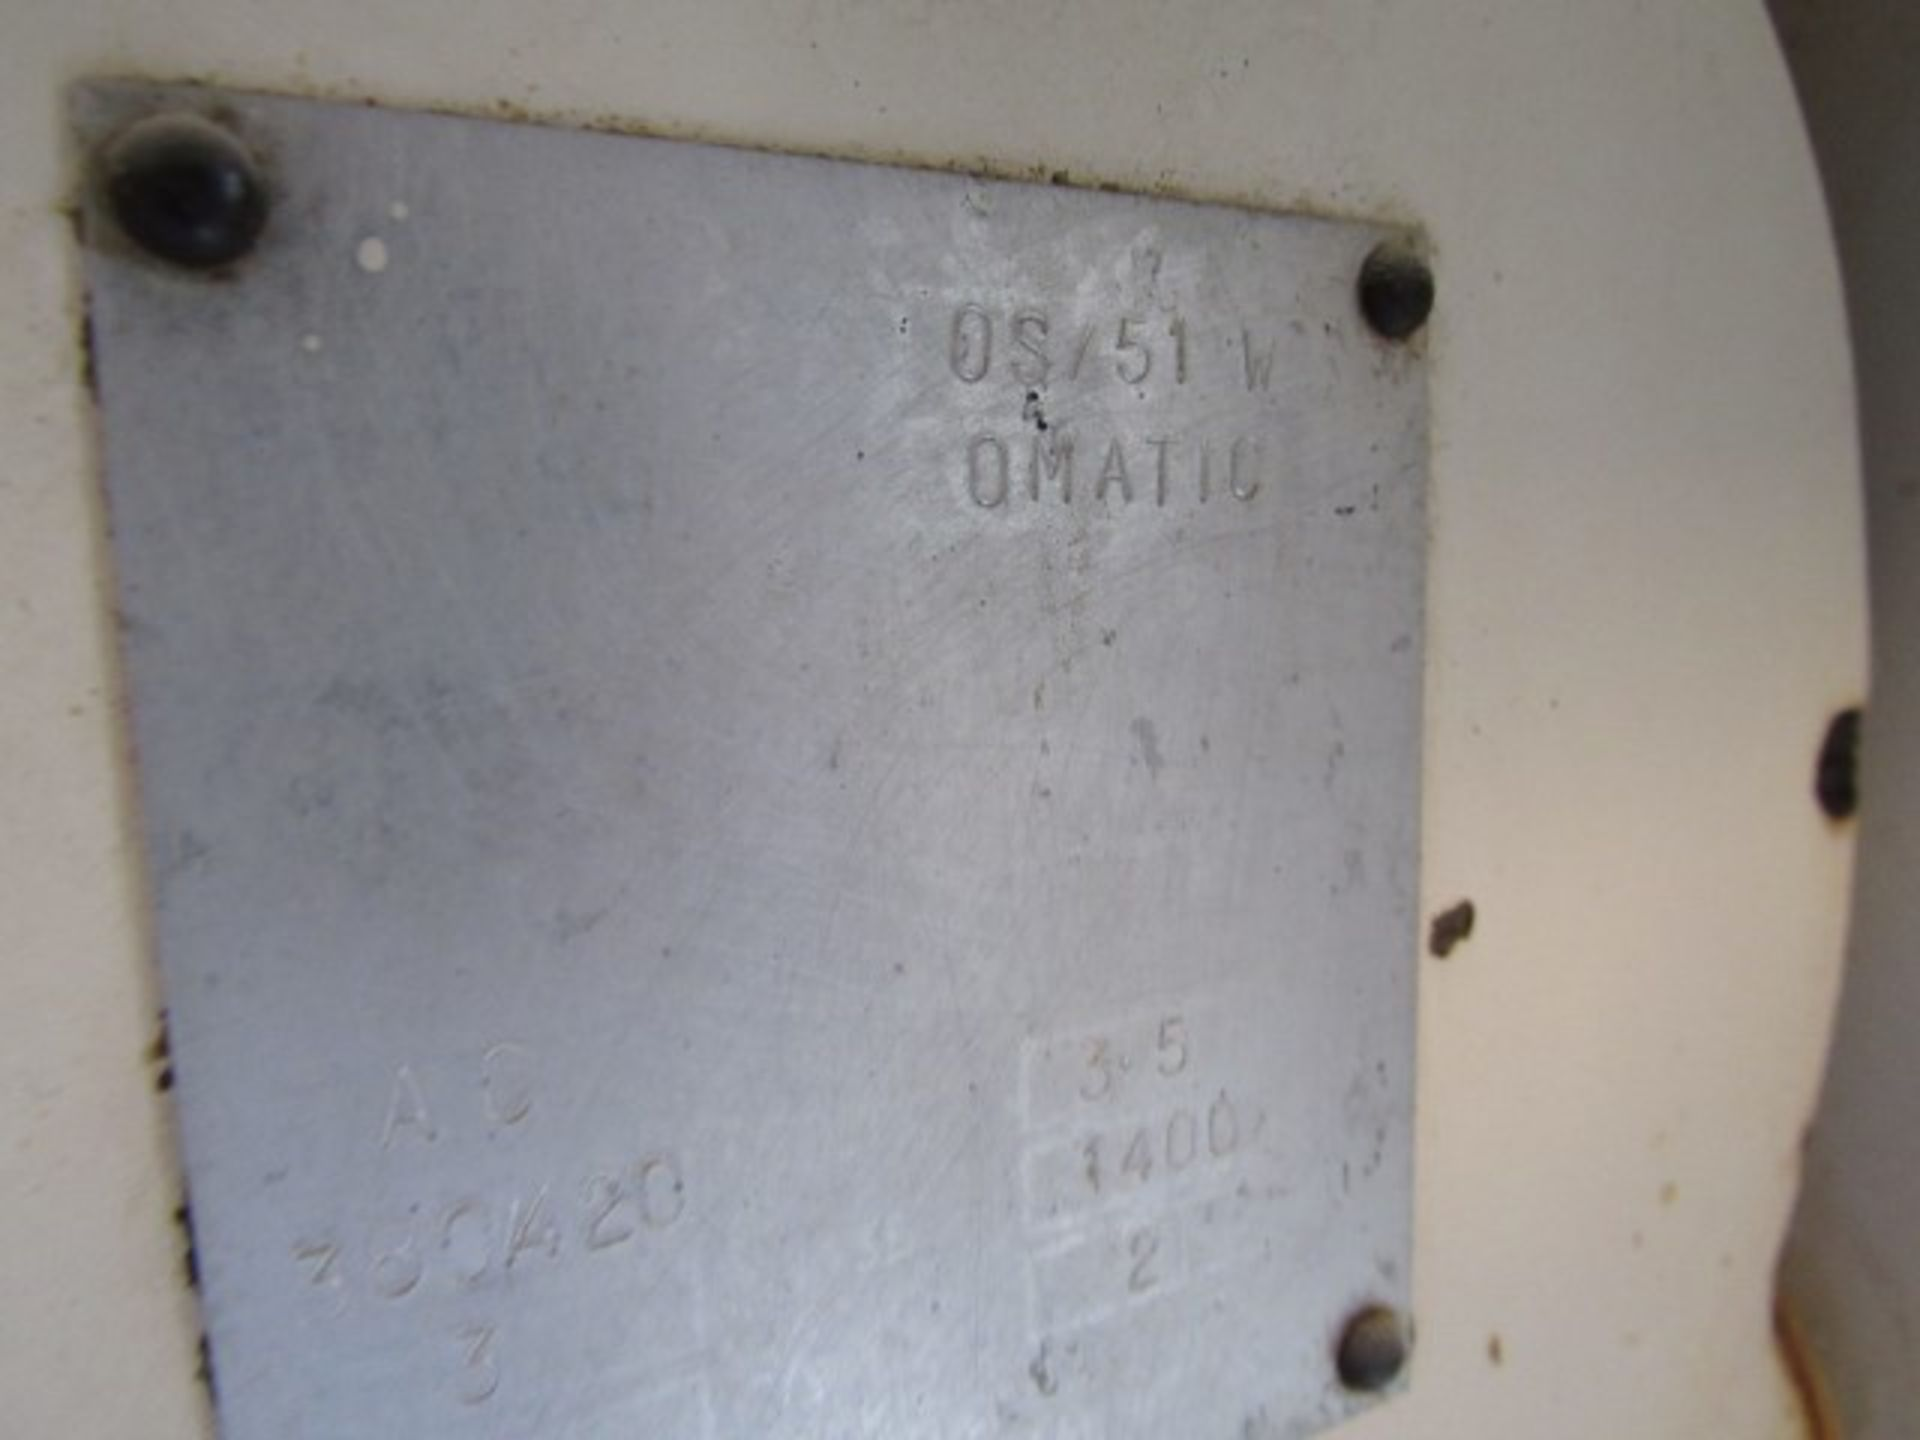 Lot 9 - Omatic Pie Machine 05 51W, 6 Station, No Filler